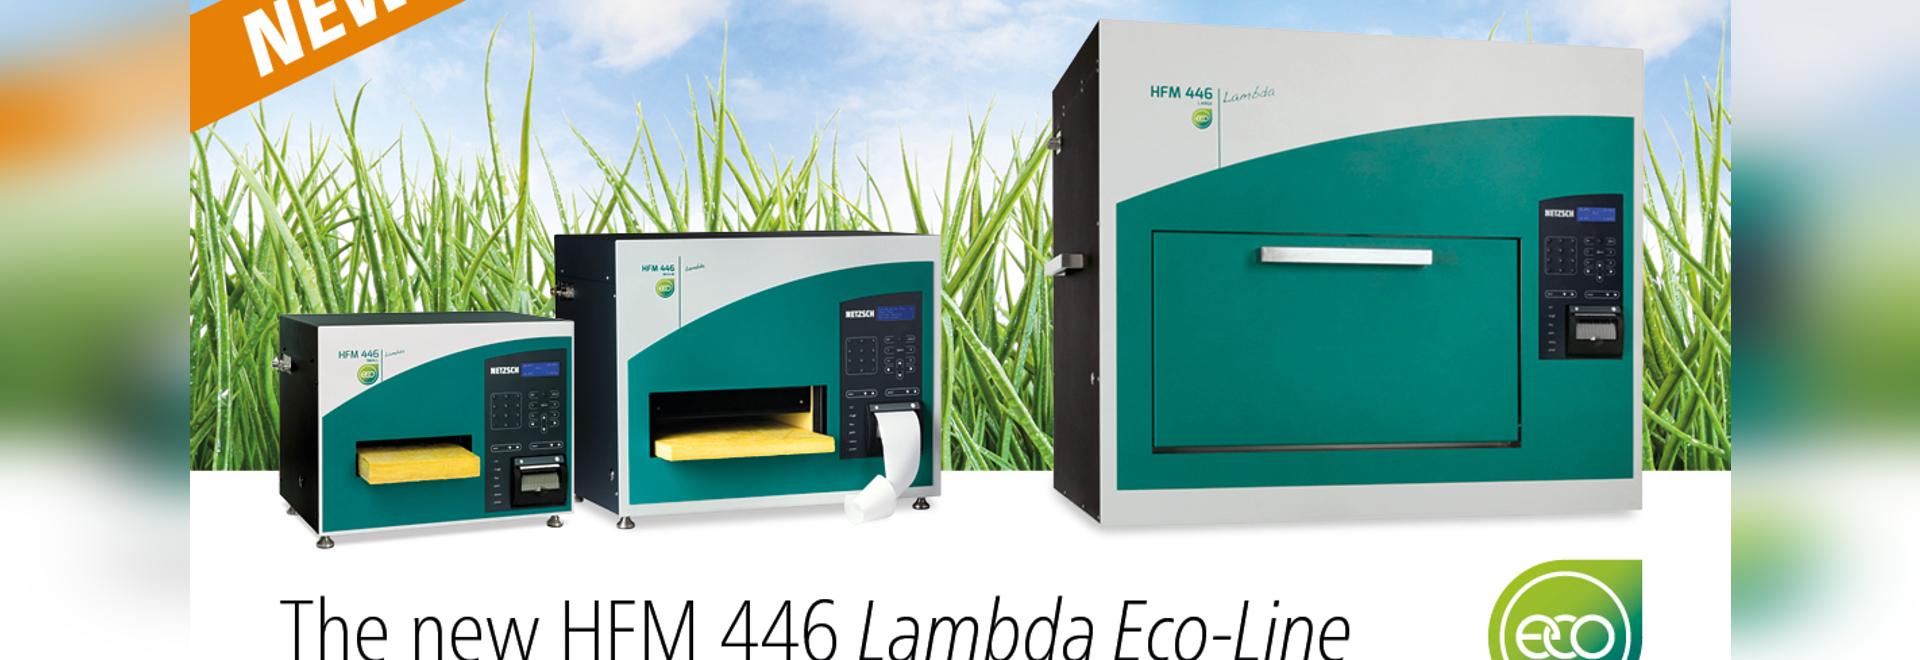 The New HFM 446 Lambda Eco-Line